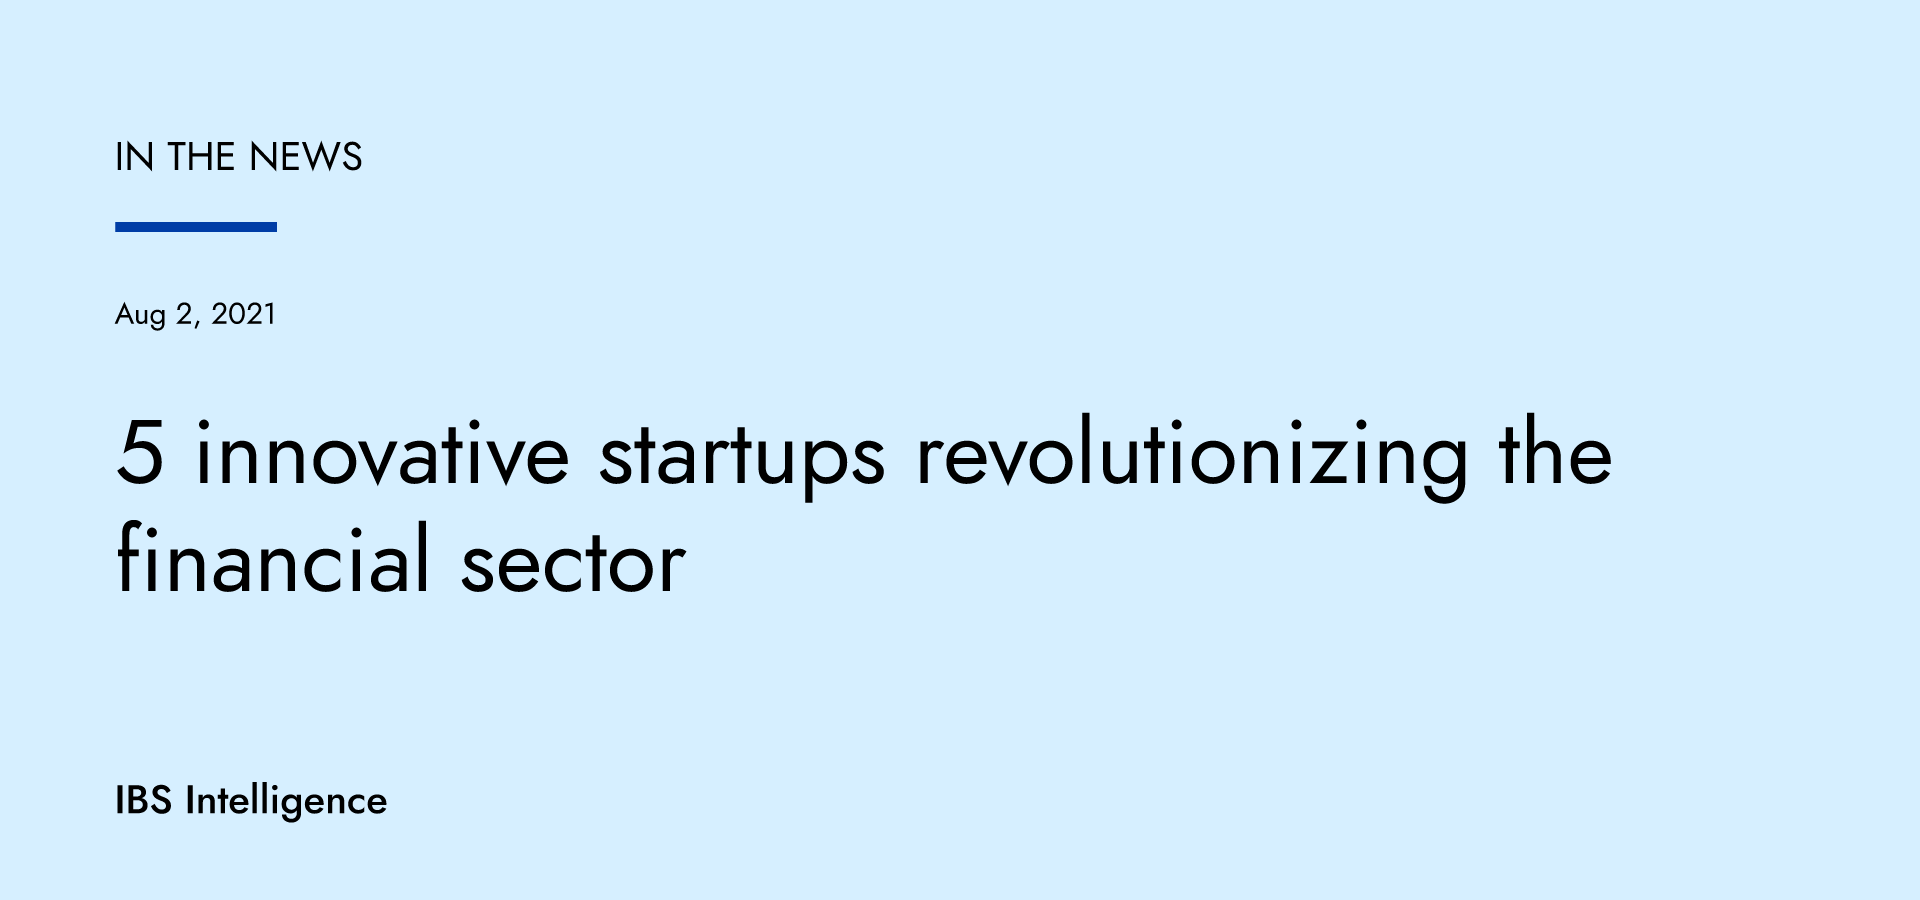 5 innovative startups revolutionizing the financial sector